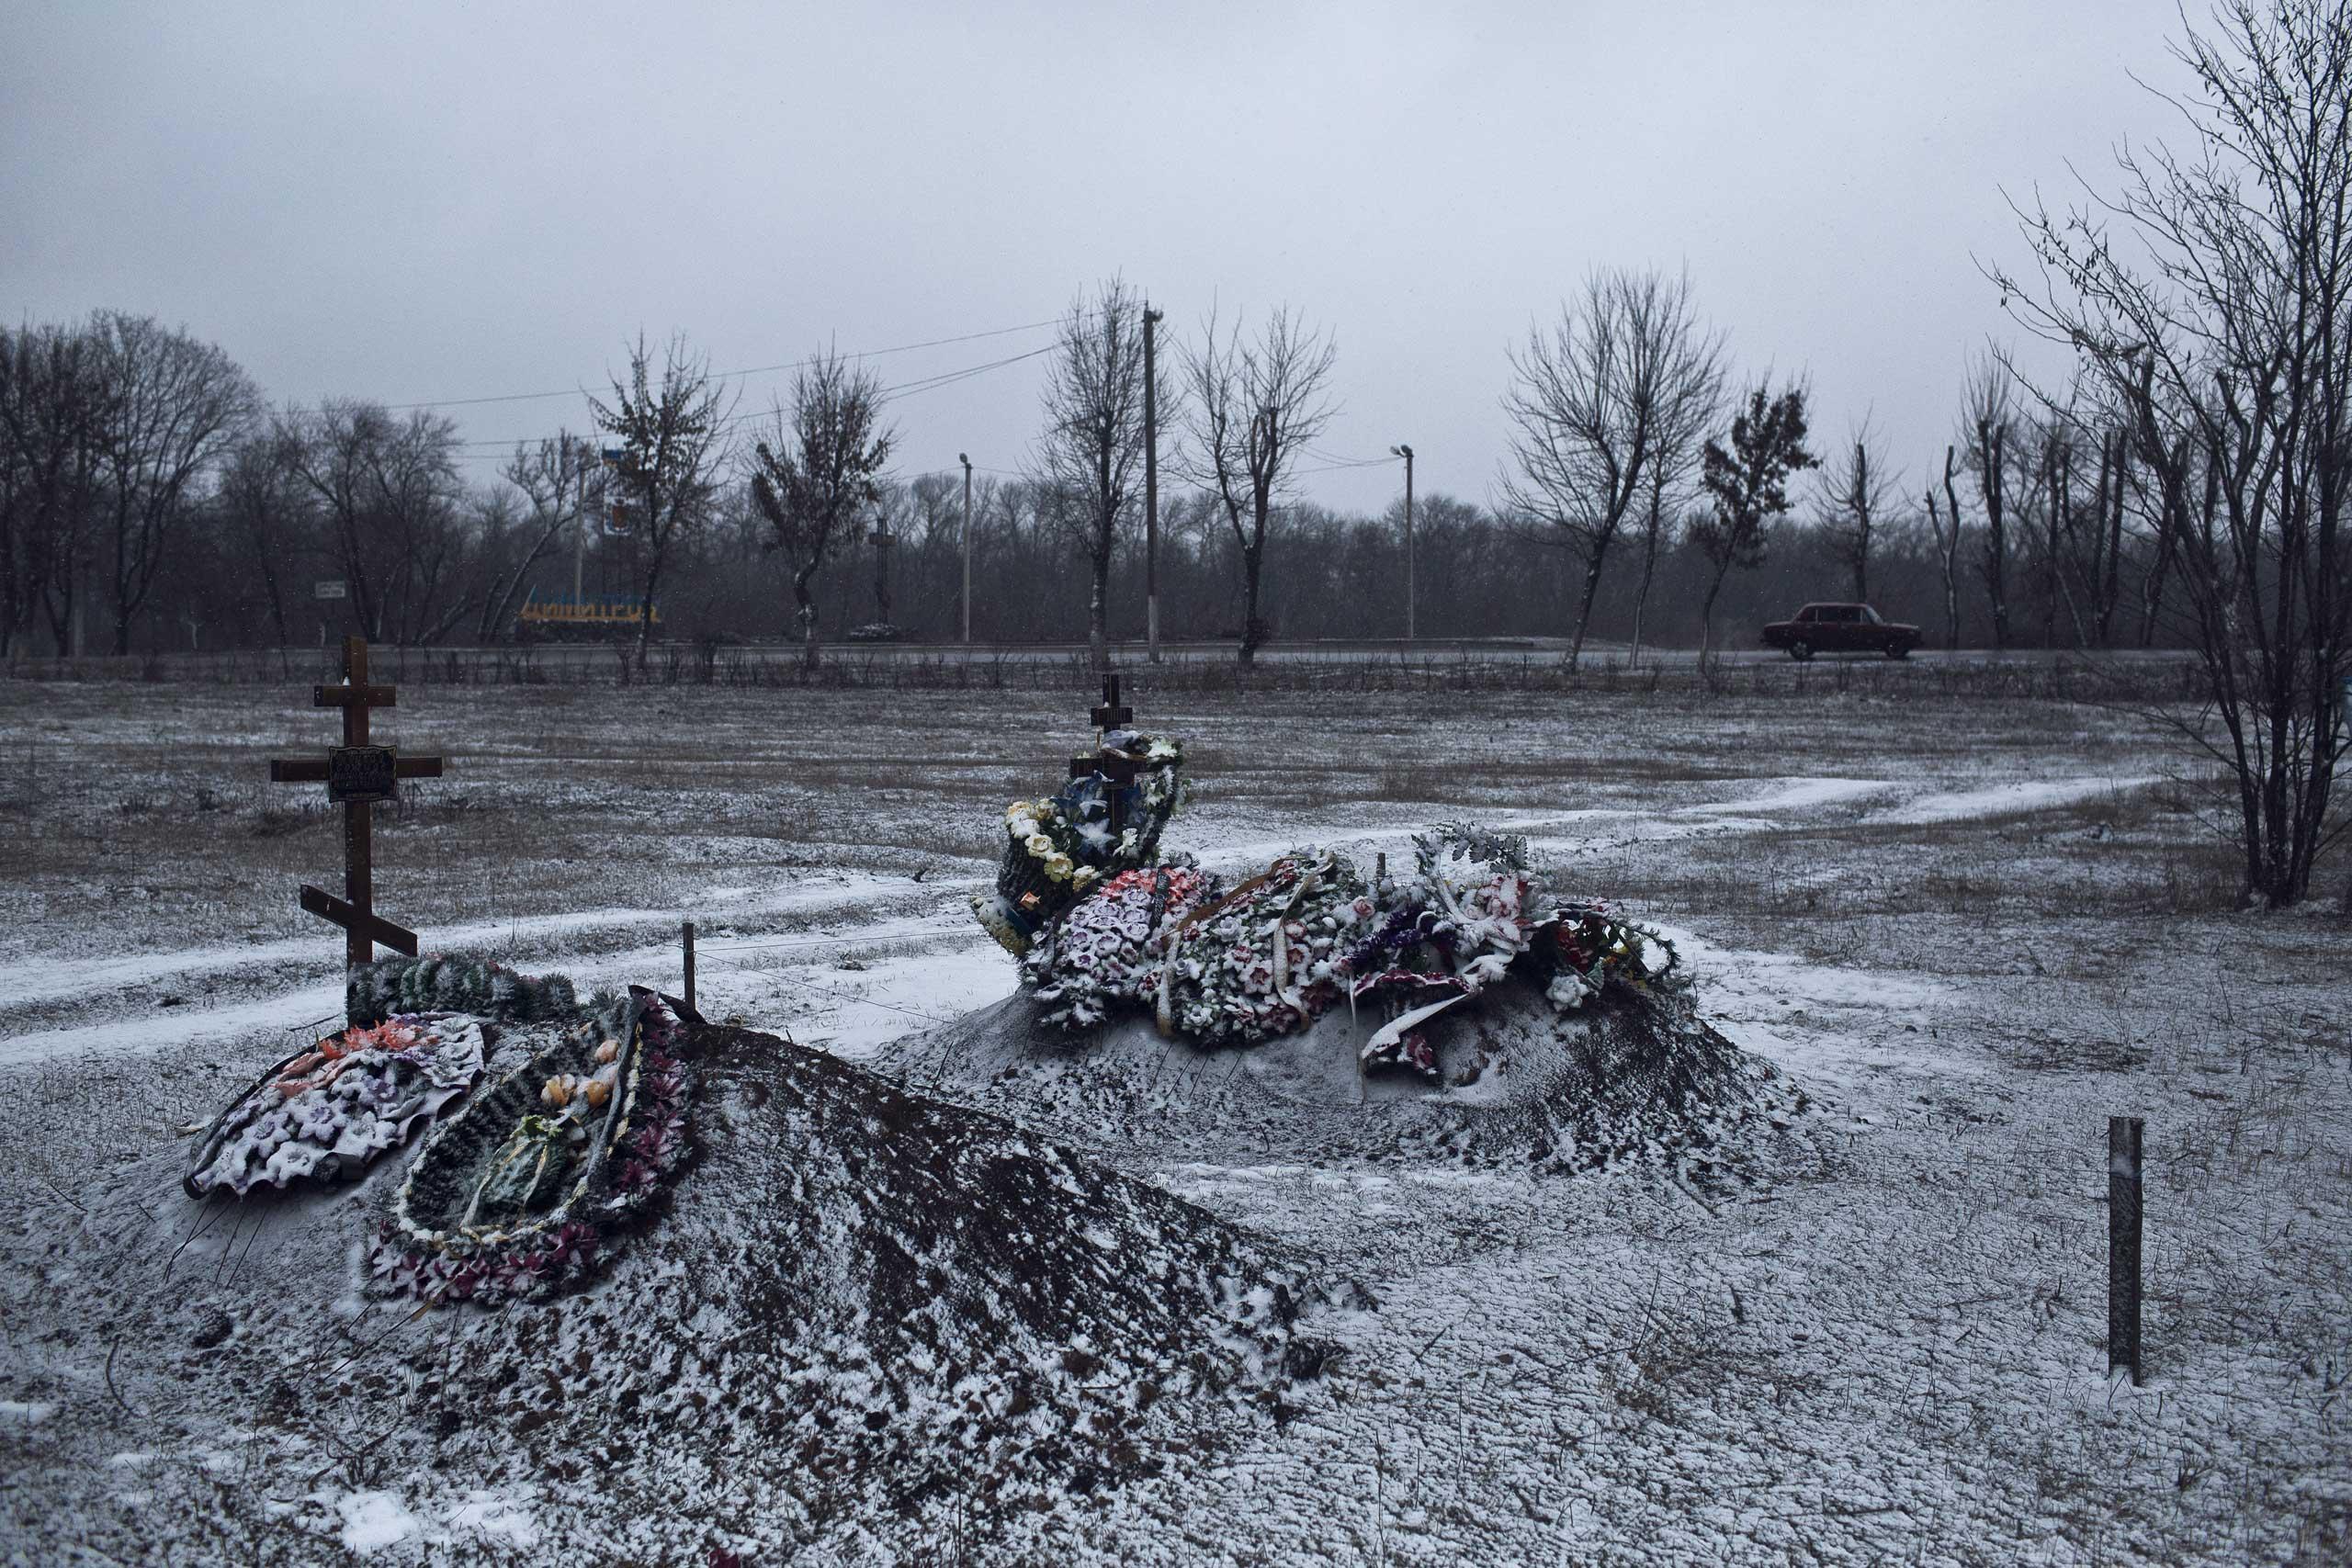 Fresh graves on the outskirts of the town of Avdiivka, Ukraine, Feb. 9, 2015.